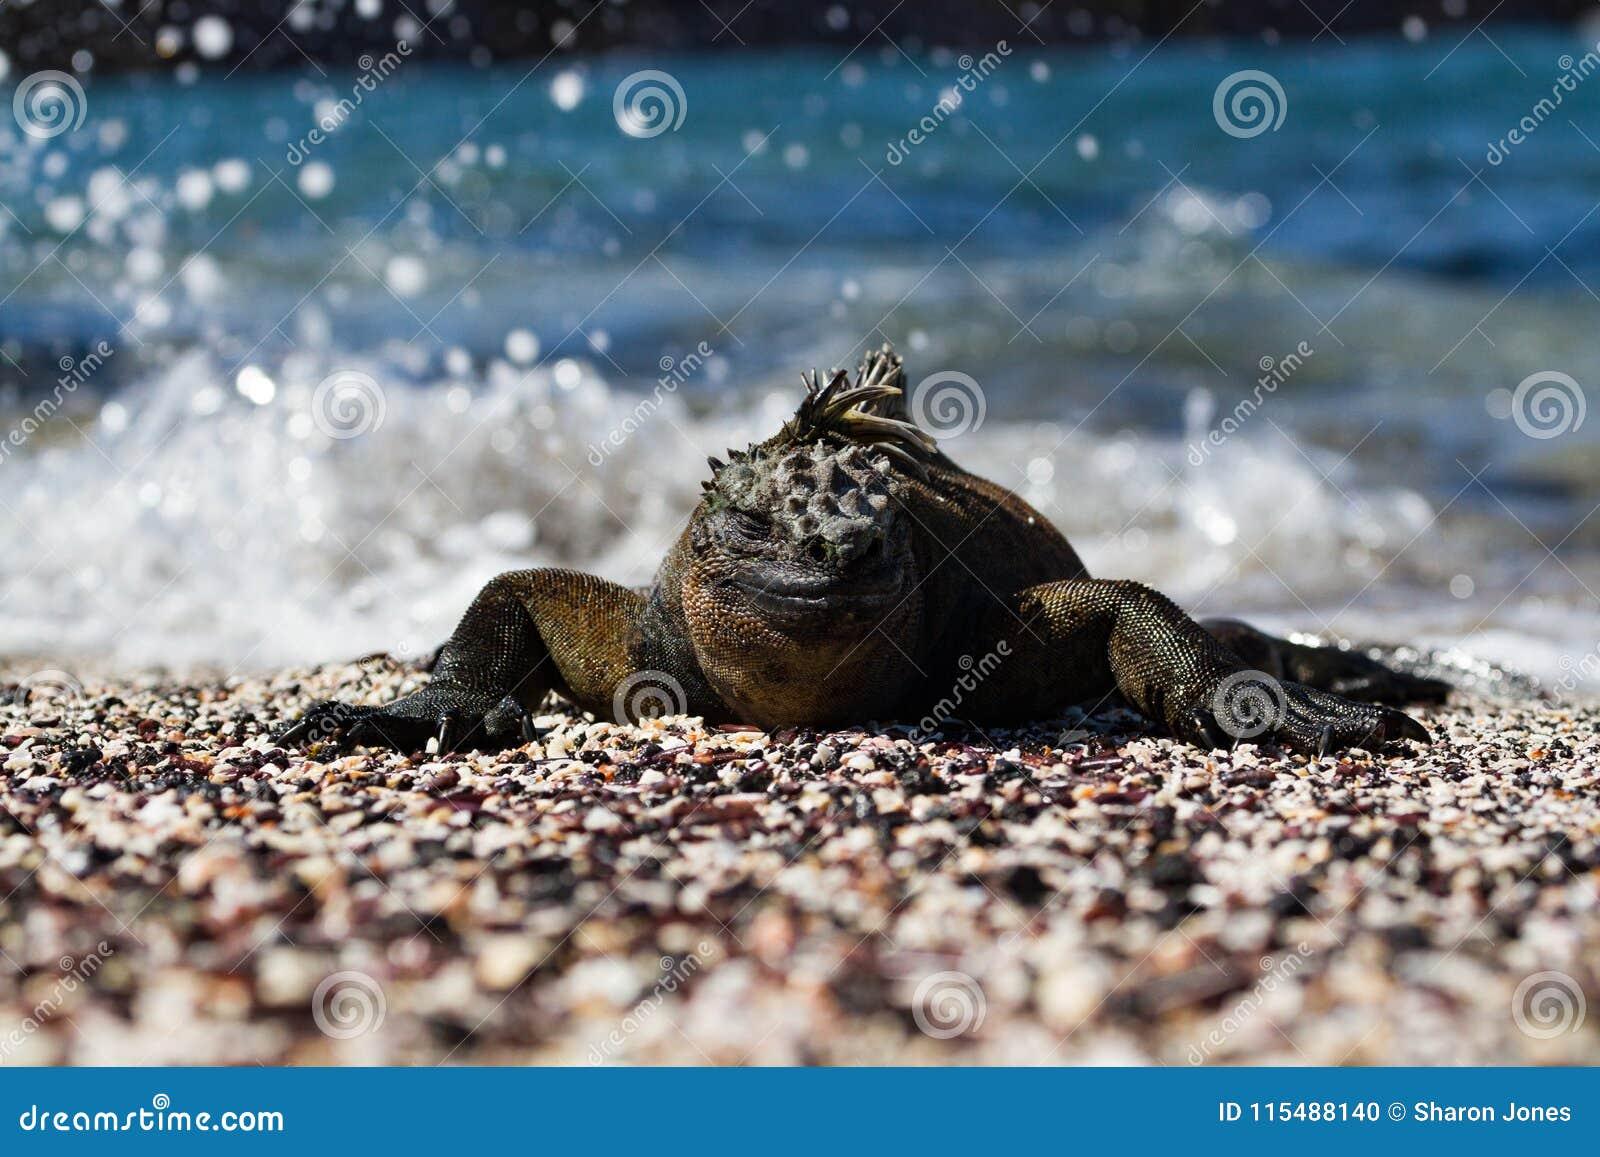 Galapagos Marine Iguana Amblyrhynchus cristatus on sunning itself on a beach, Galapagos Islands